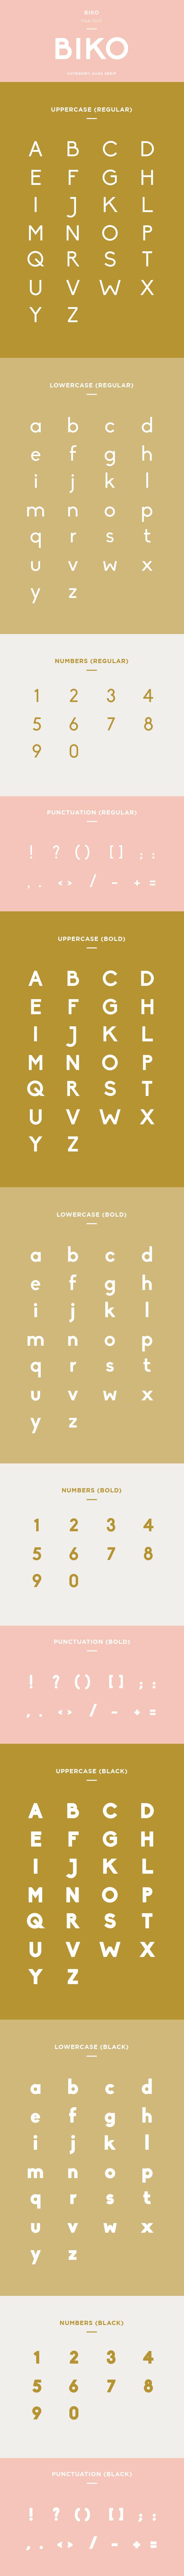 biko font example